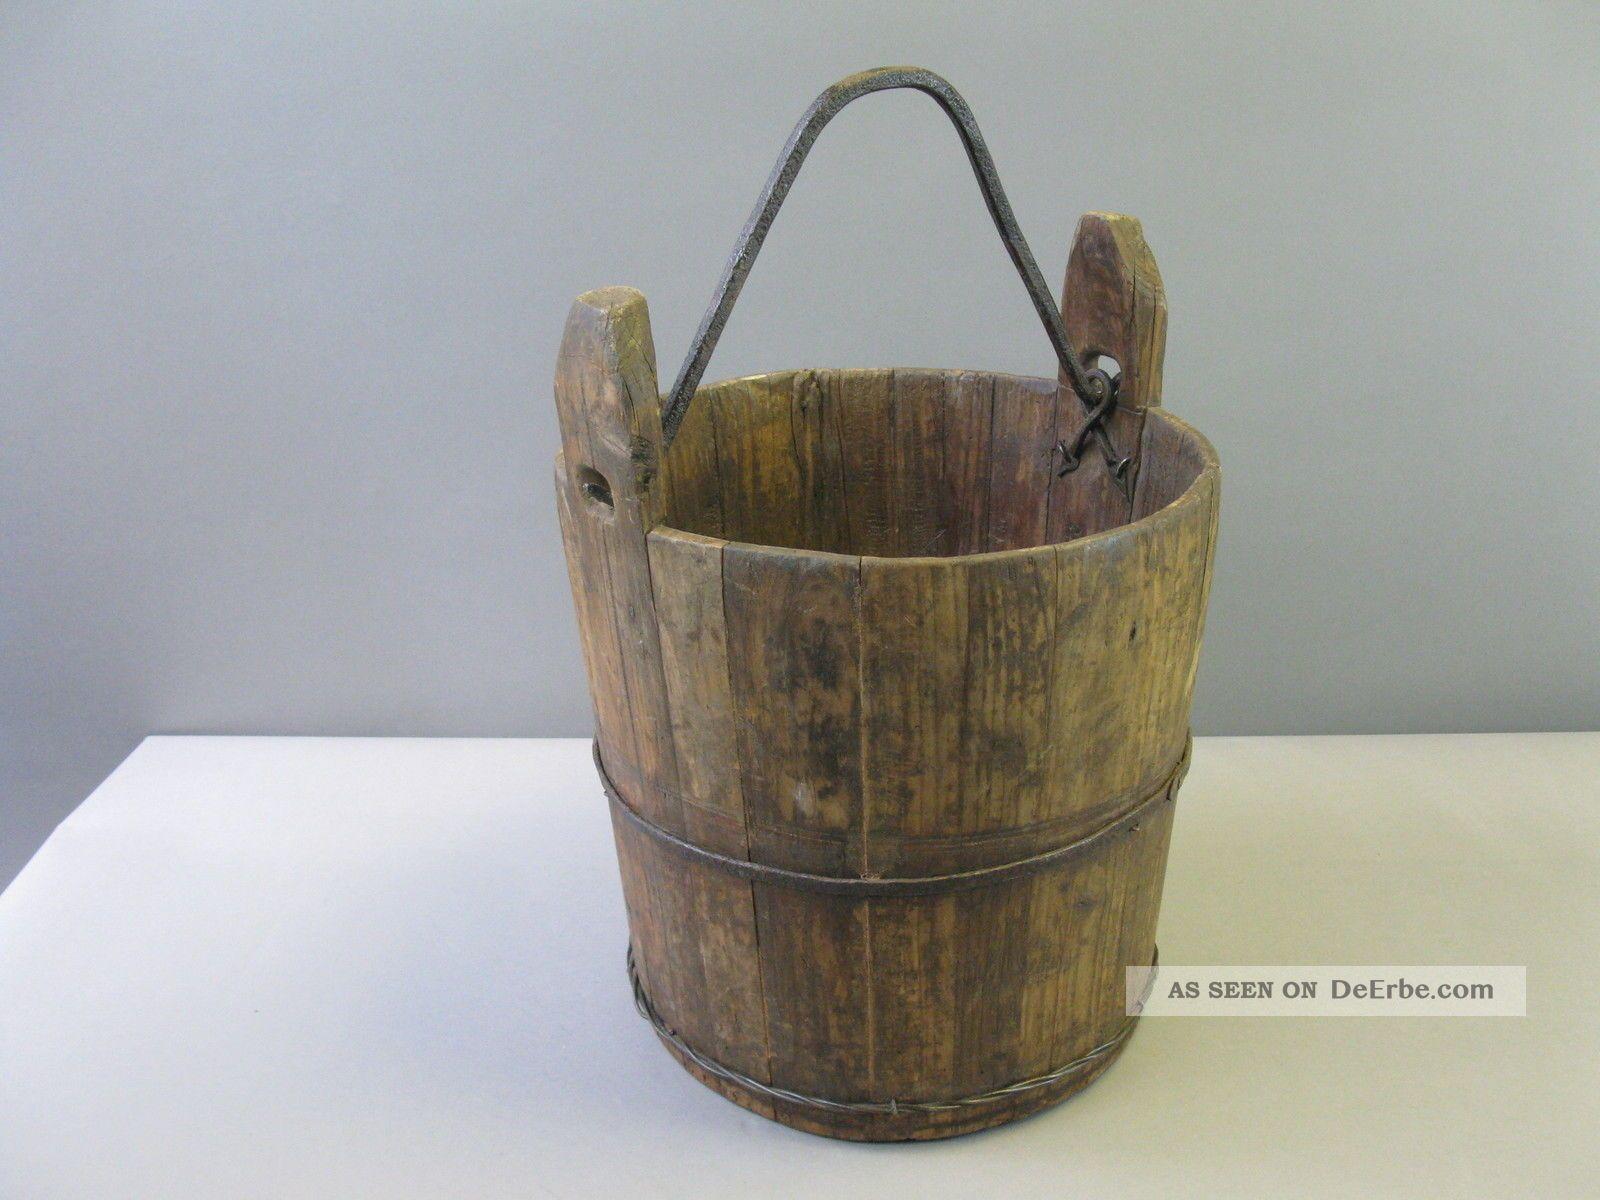 Antiquitäten & Kunst Antiker Brunneneimer